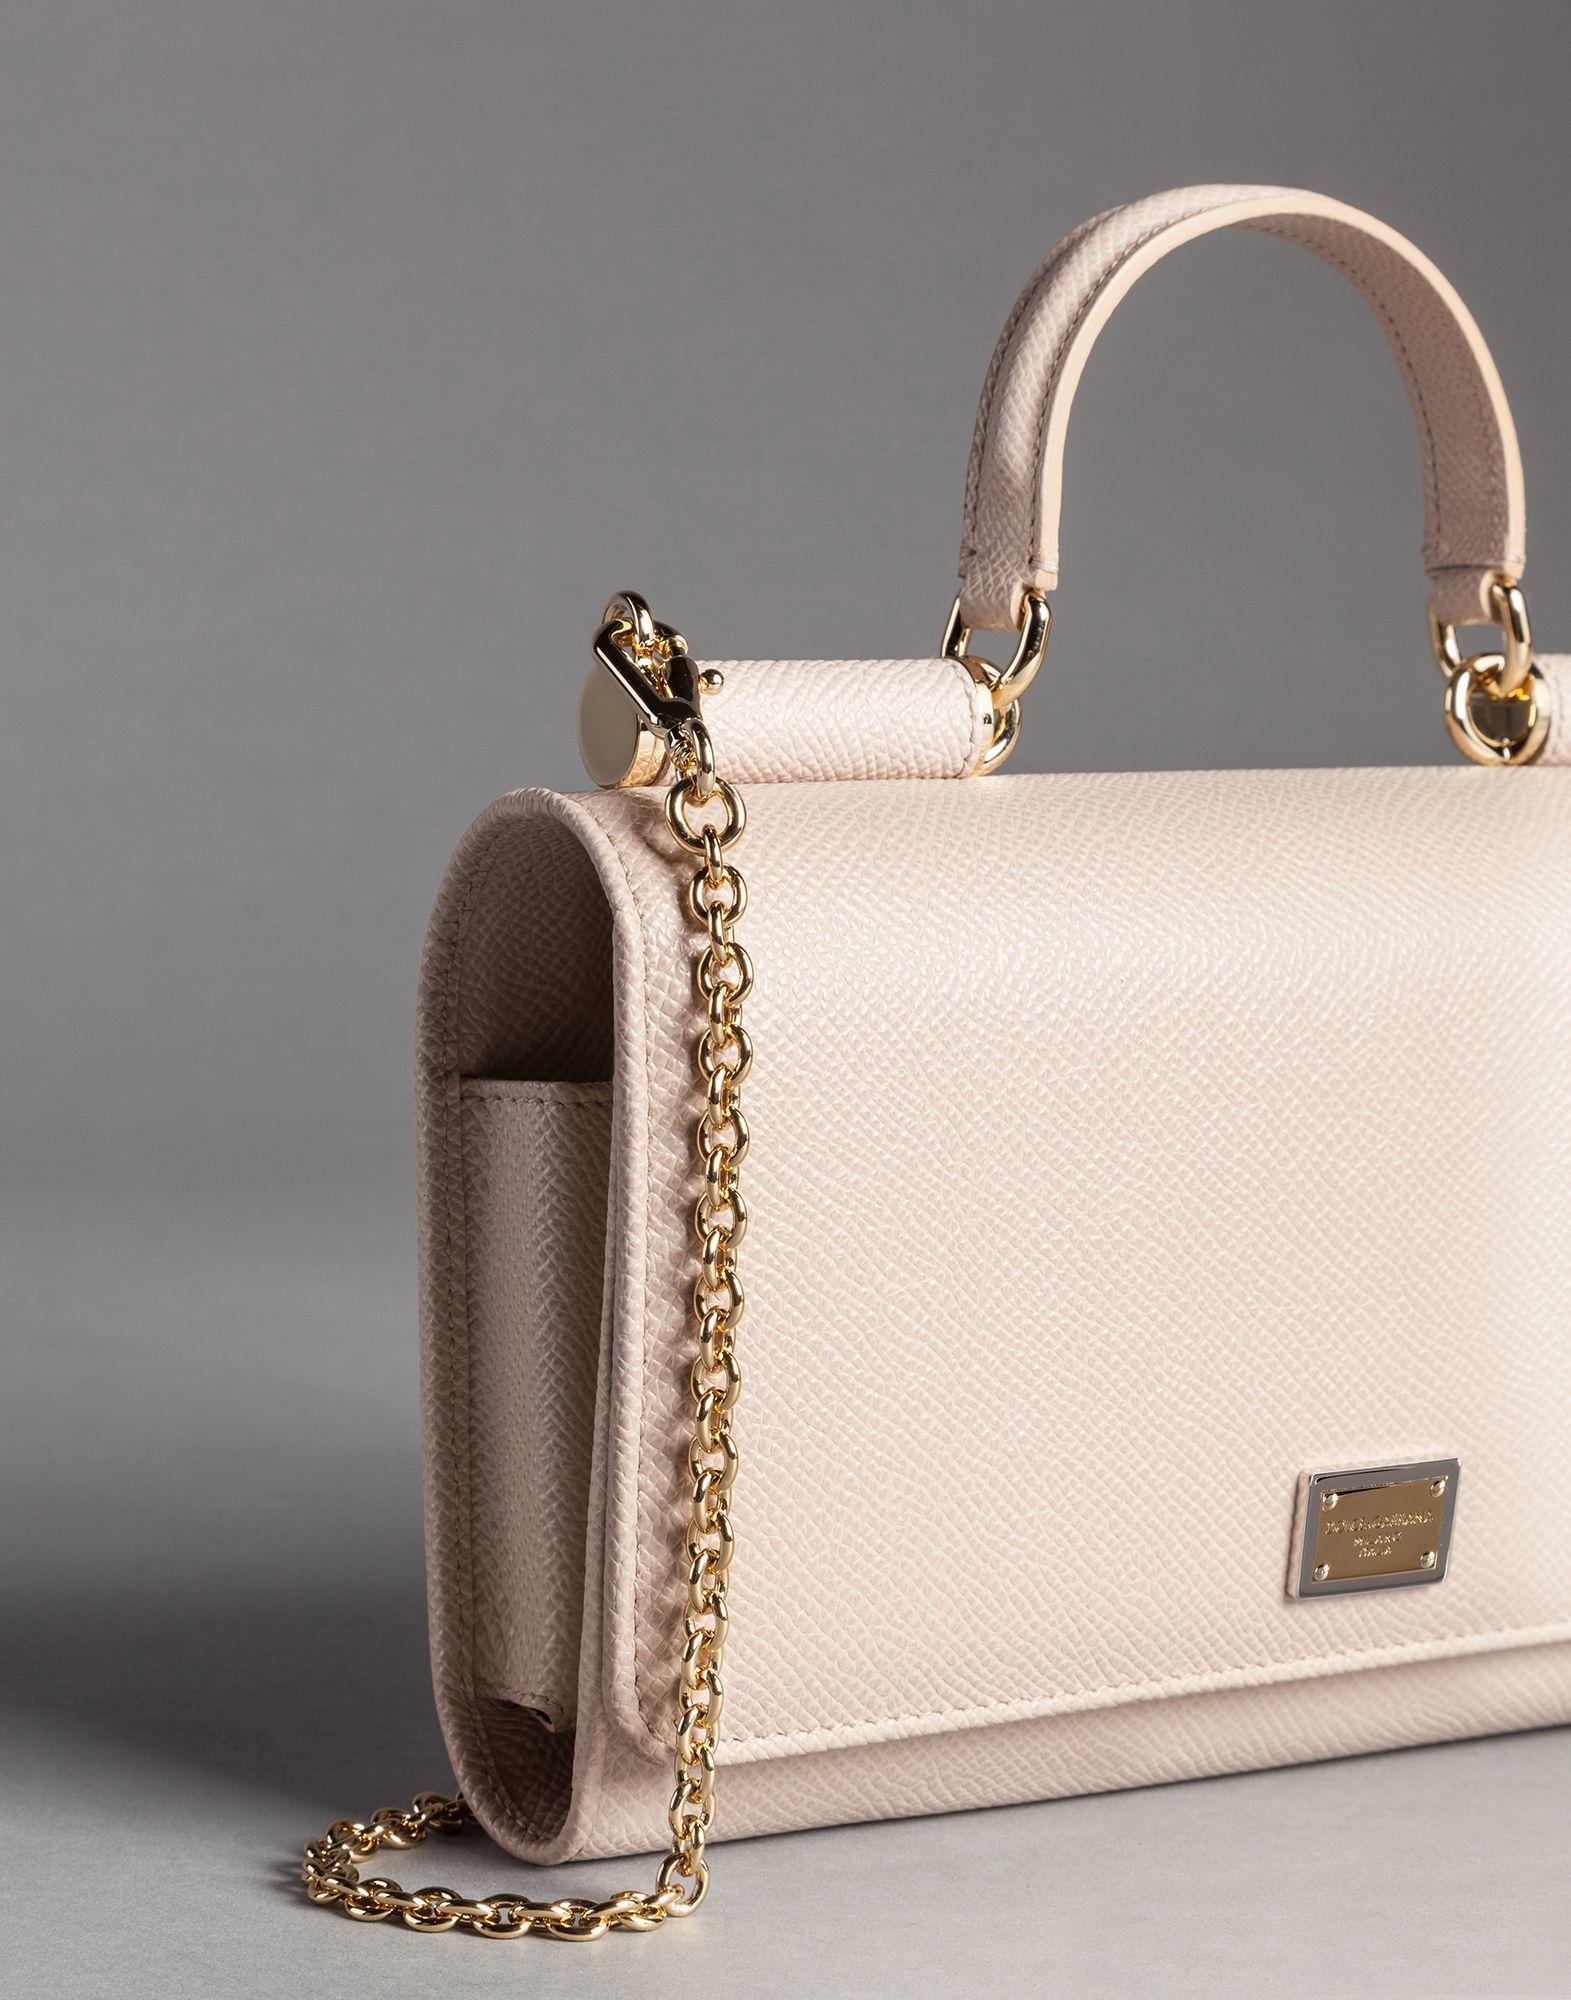 02b9721f638 Dolce   Gabbana Dauphine Print Calfskin Mini Von Bag With Lipstick ...